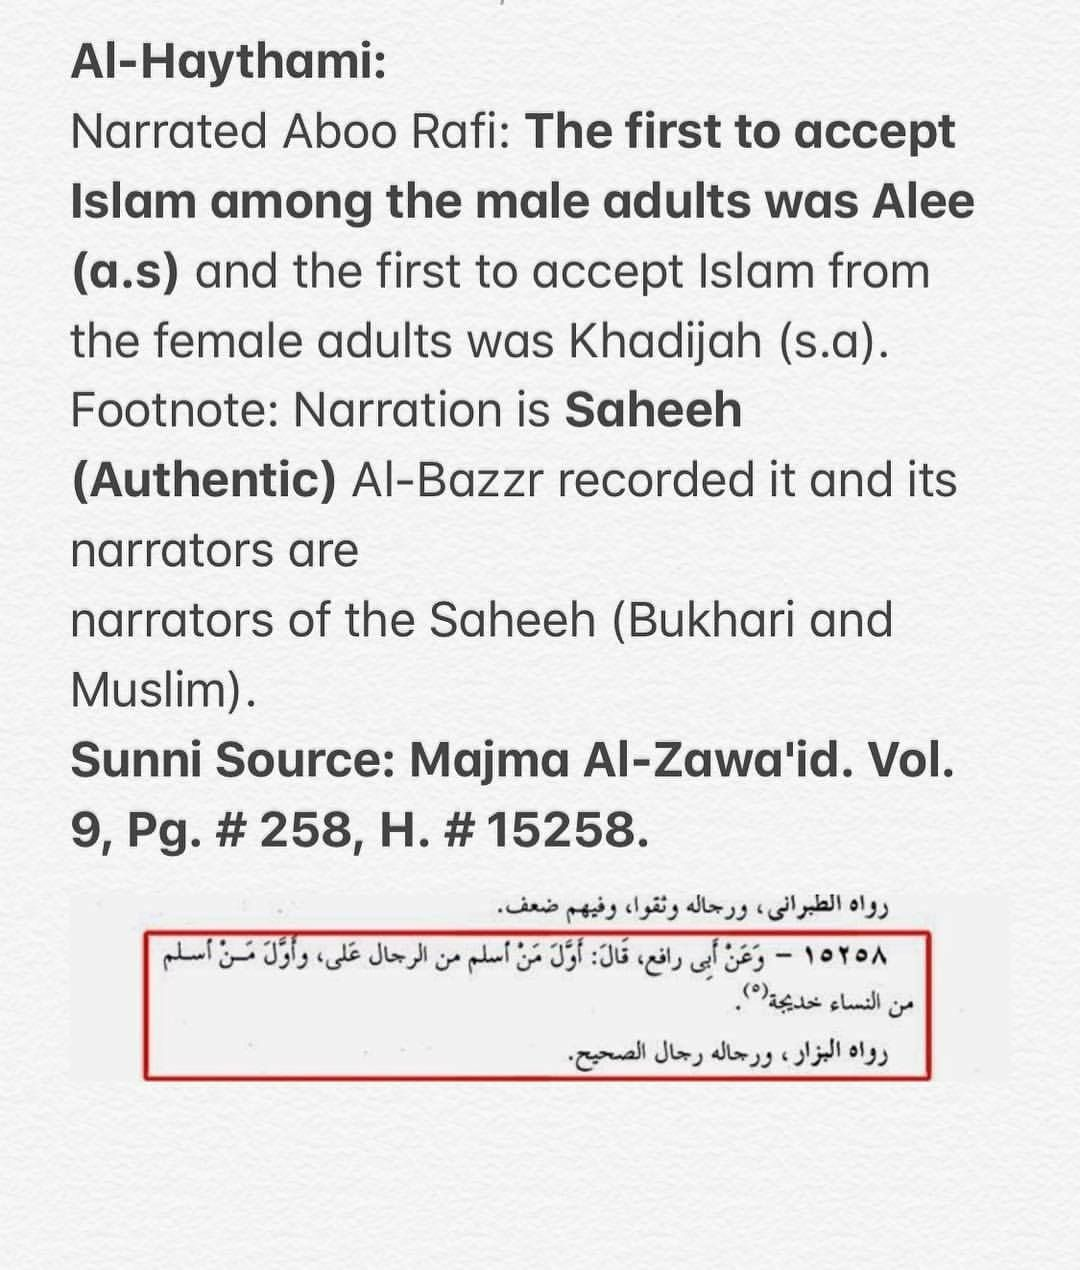 Pin On Quran Prophet Muhammad Sawa Ahl Al Bayt As